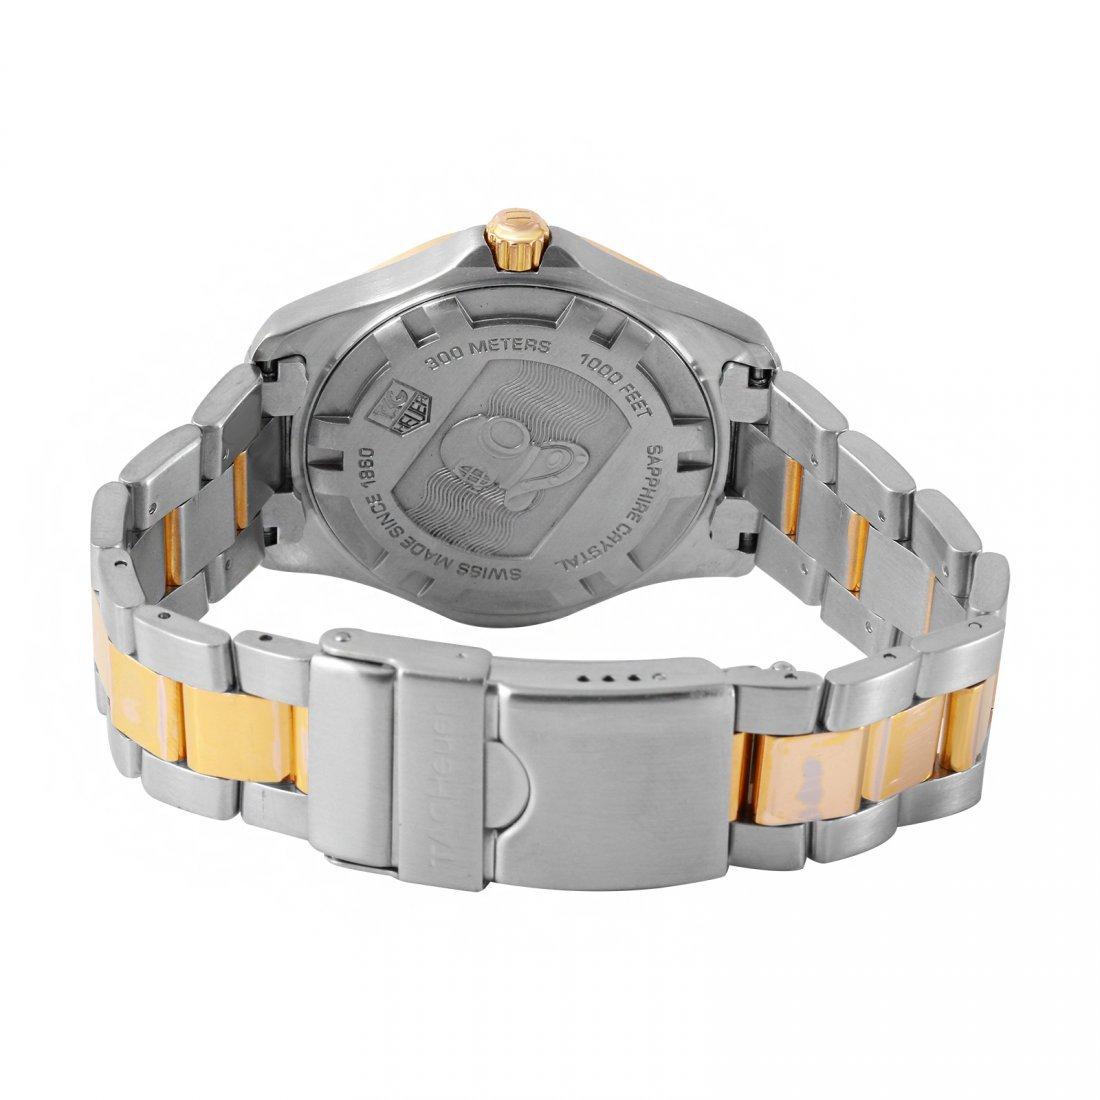 Men's Aquaracer Tag Heuer Two Tone Watch - 3